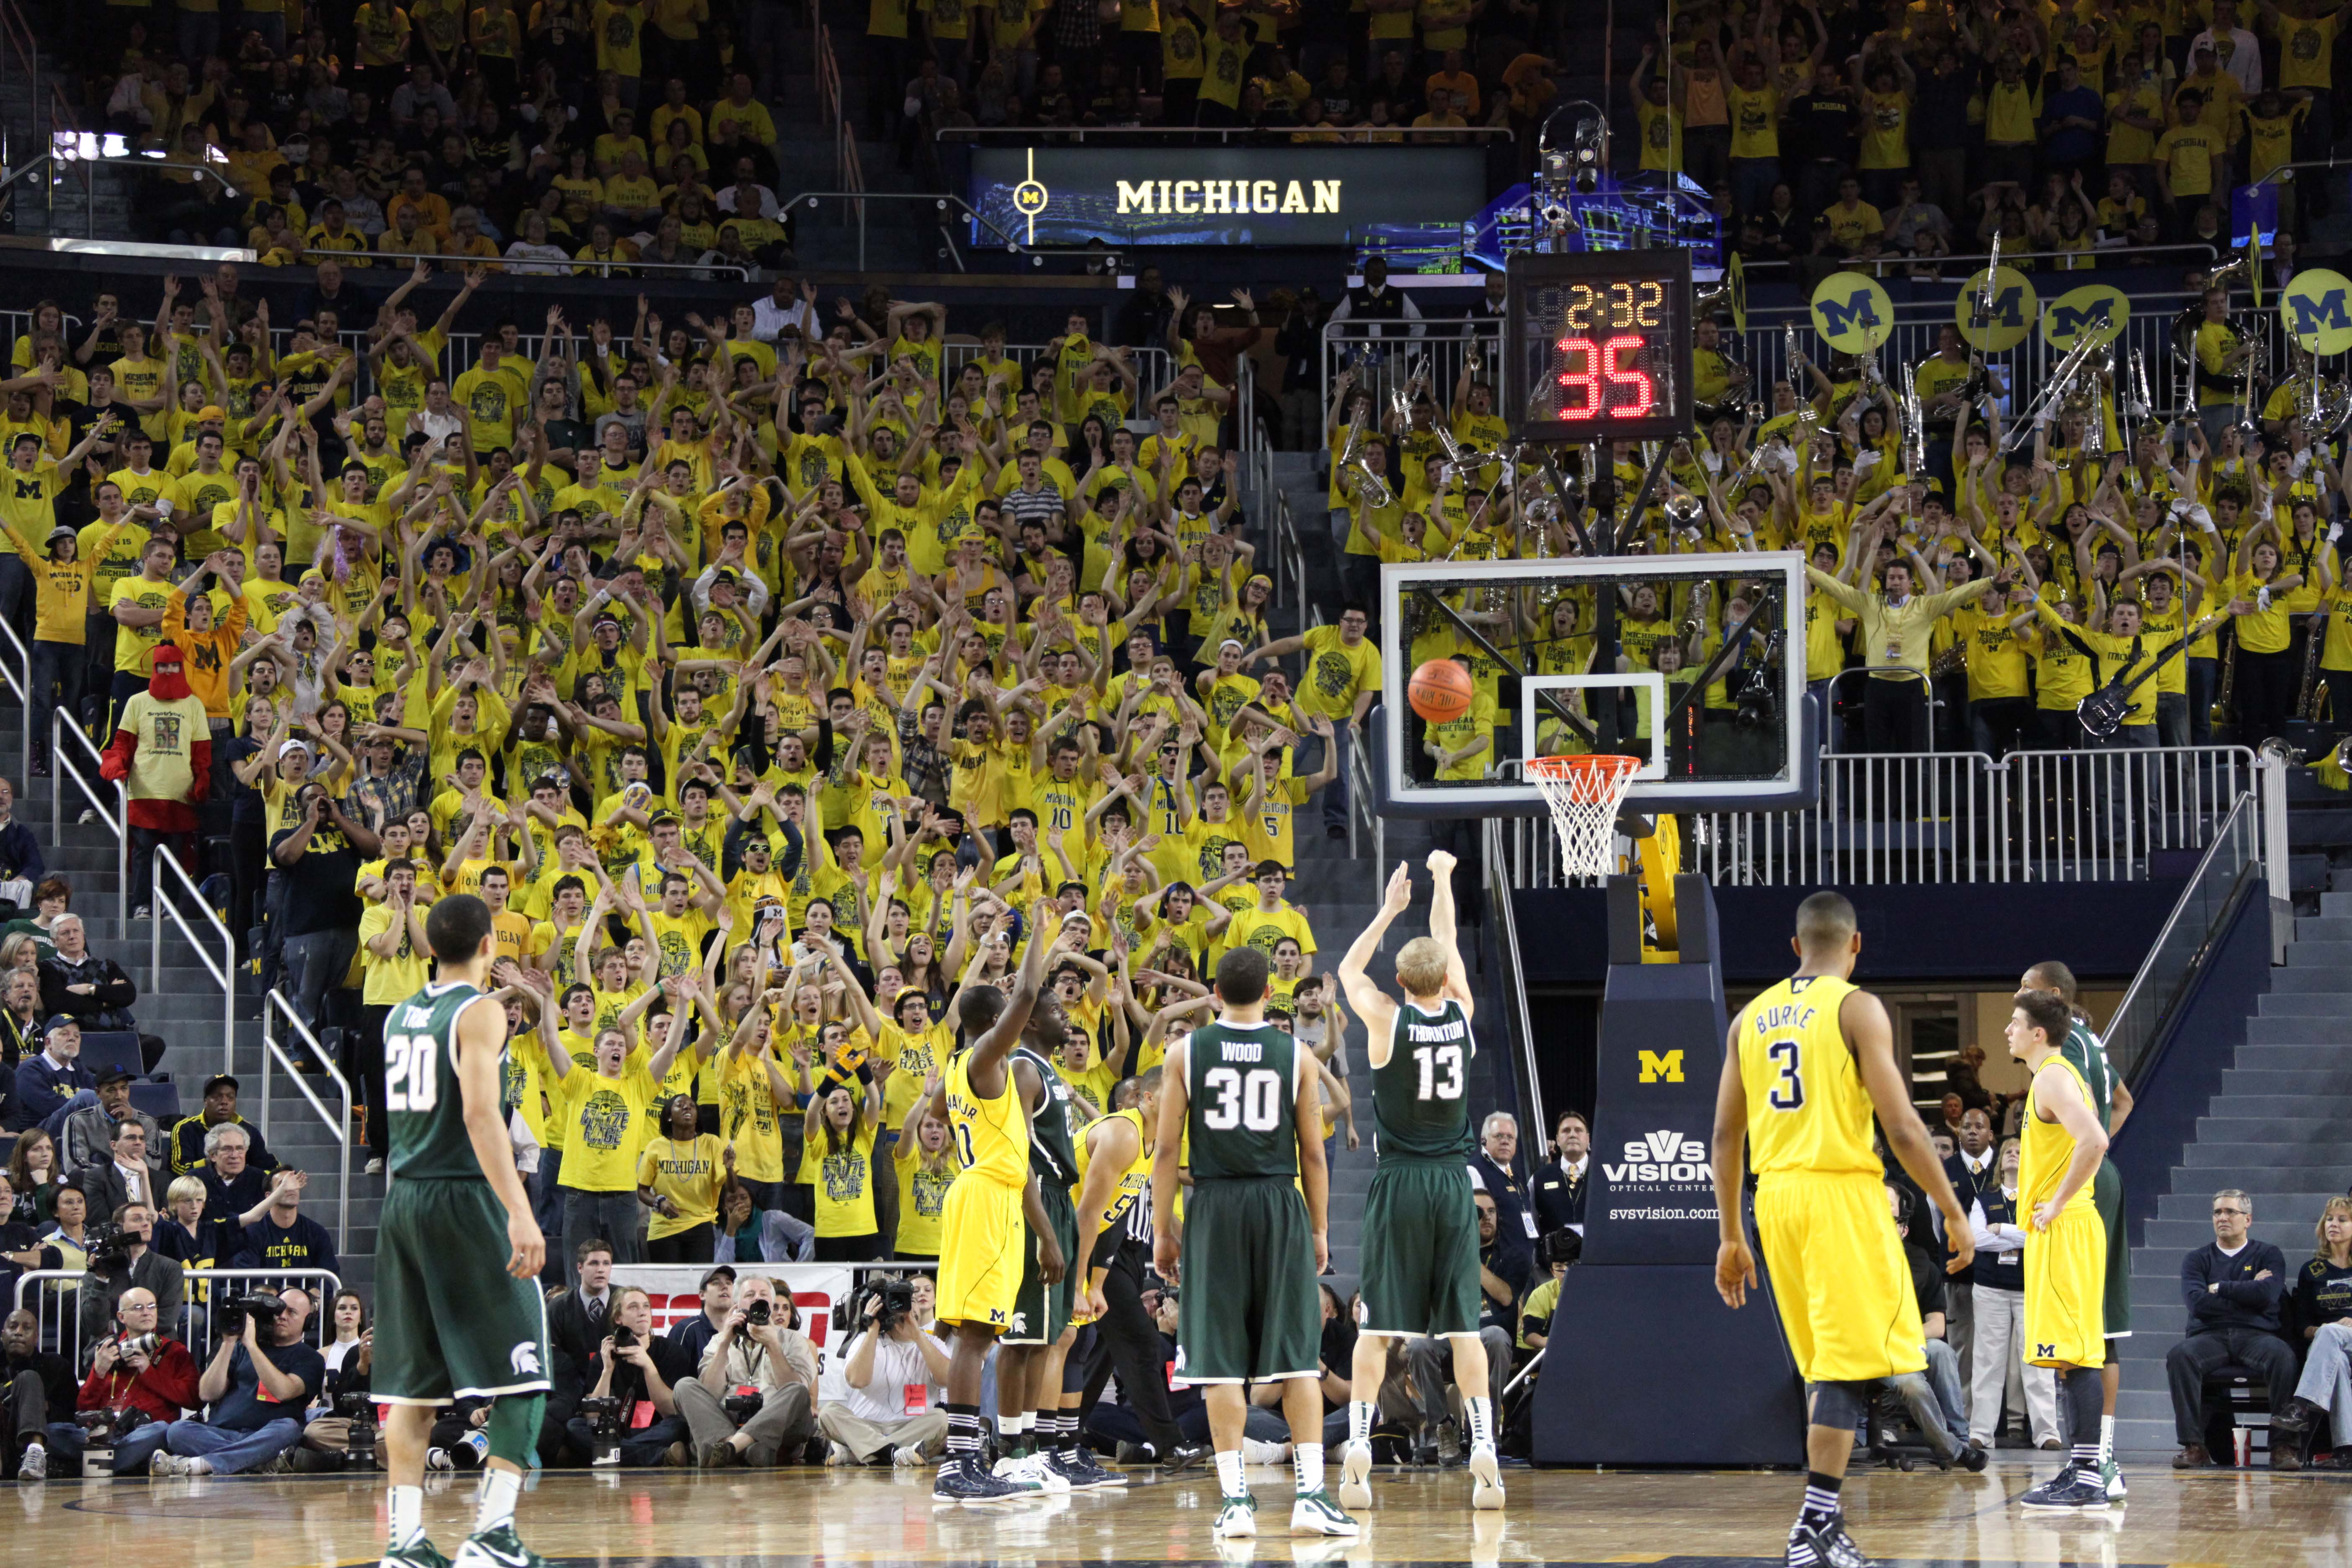 Michigan State at Michigan 26